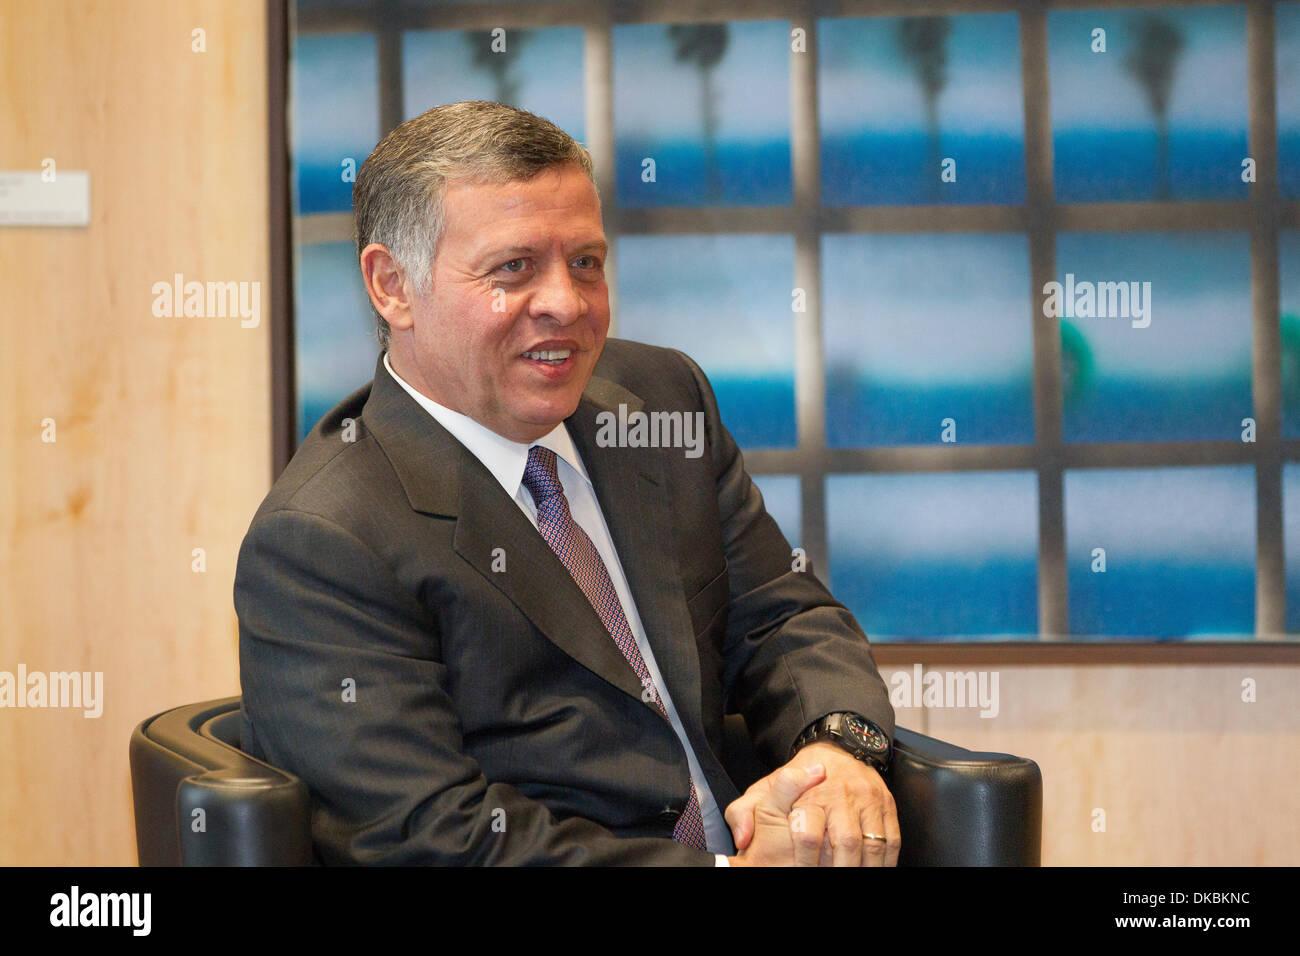 King Abdullah II of Jordan - Stock Image